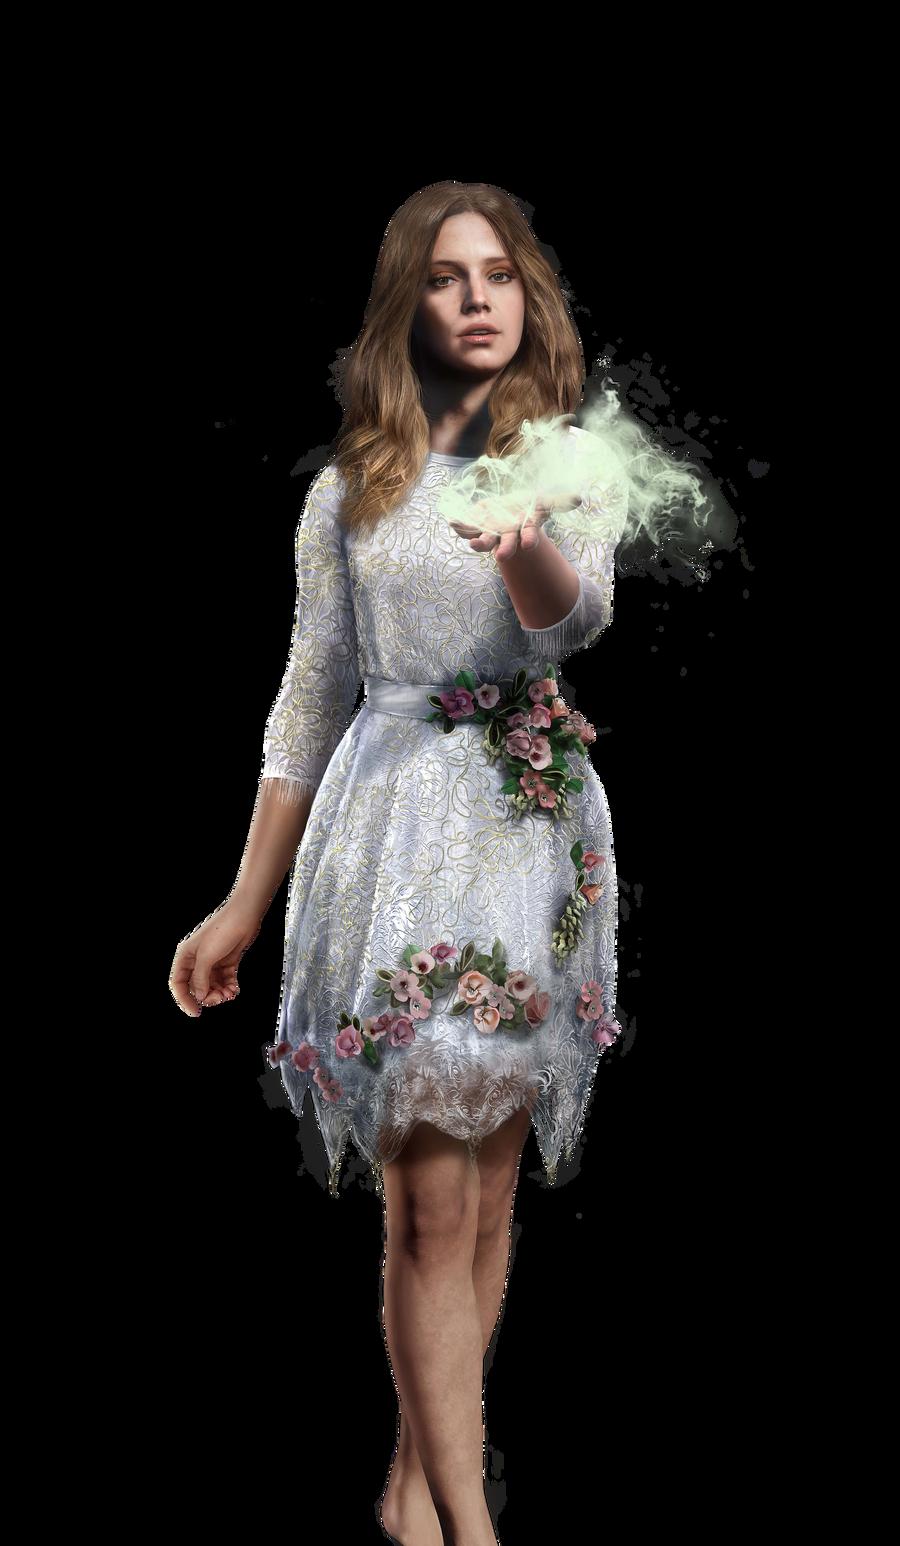 Far Cry 5 Character Faith Seed Png By Mintmovi3 On Deviantart